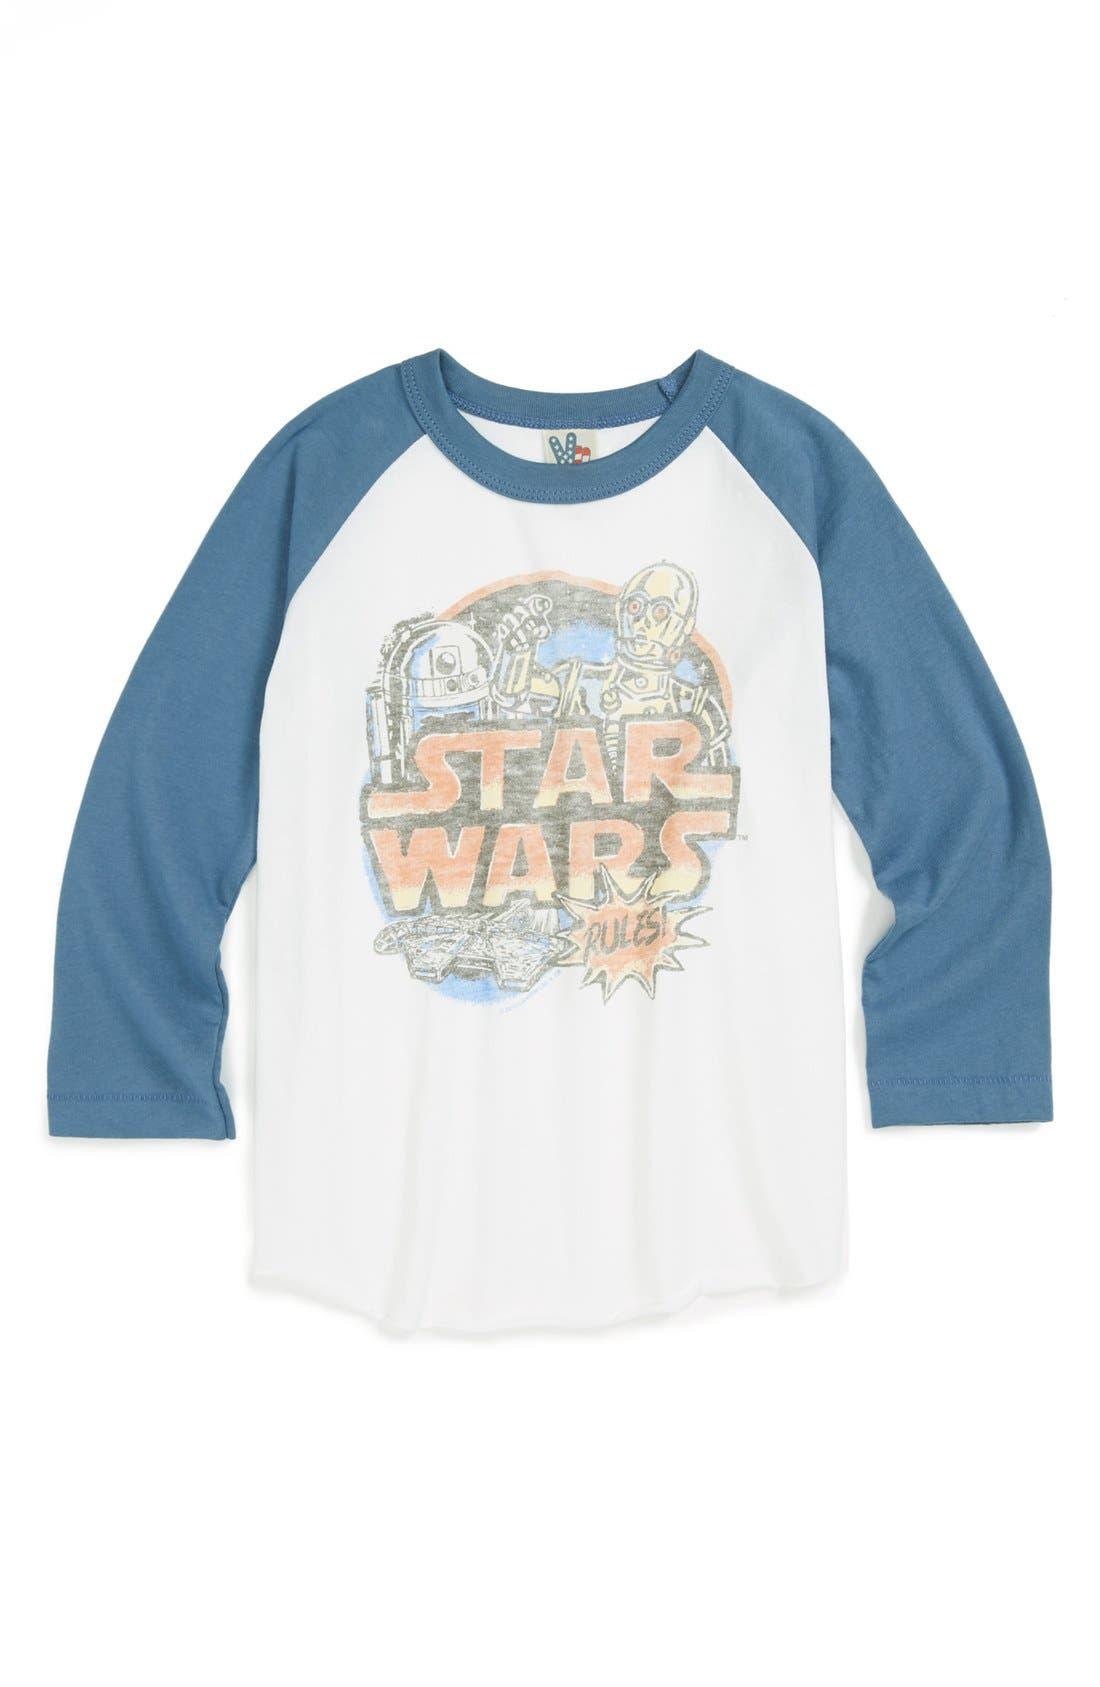 Alternate Image 1 Selected - Junk Food 'Star Wars™' Baseball T-Shirt (Toddler Boys)